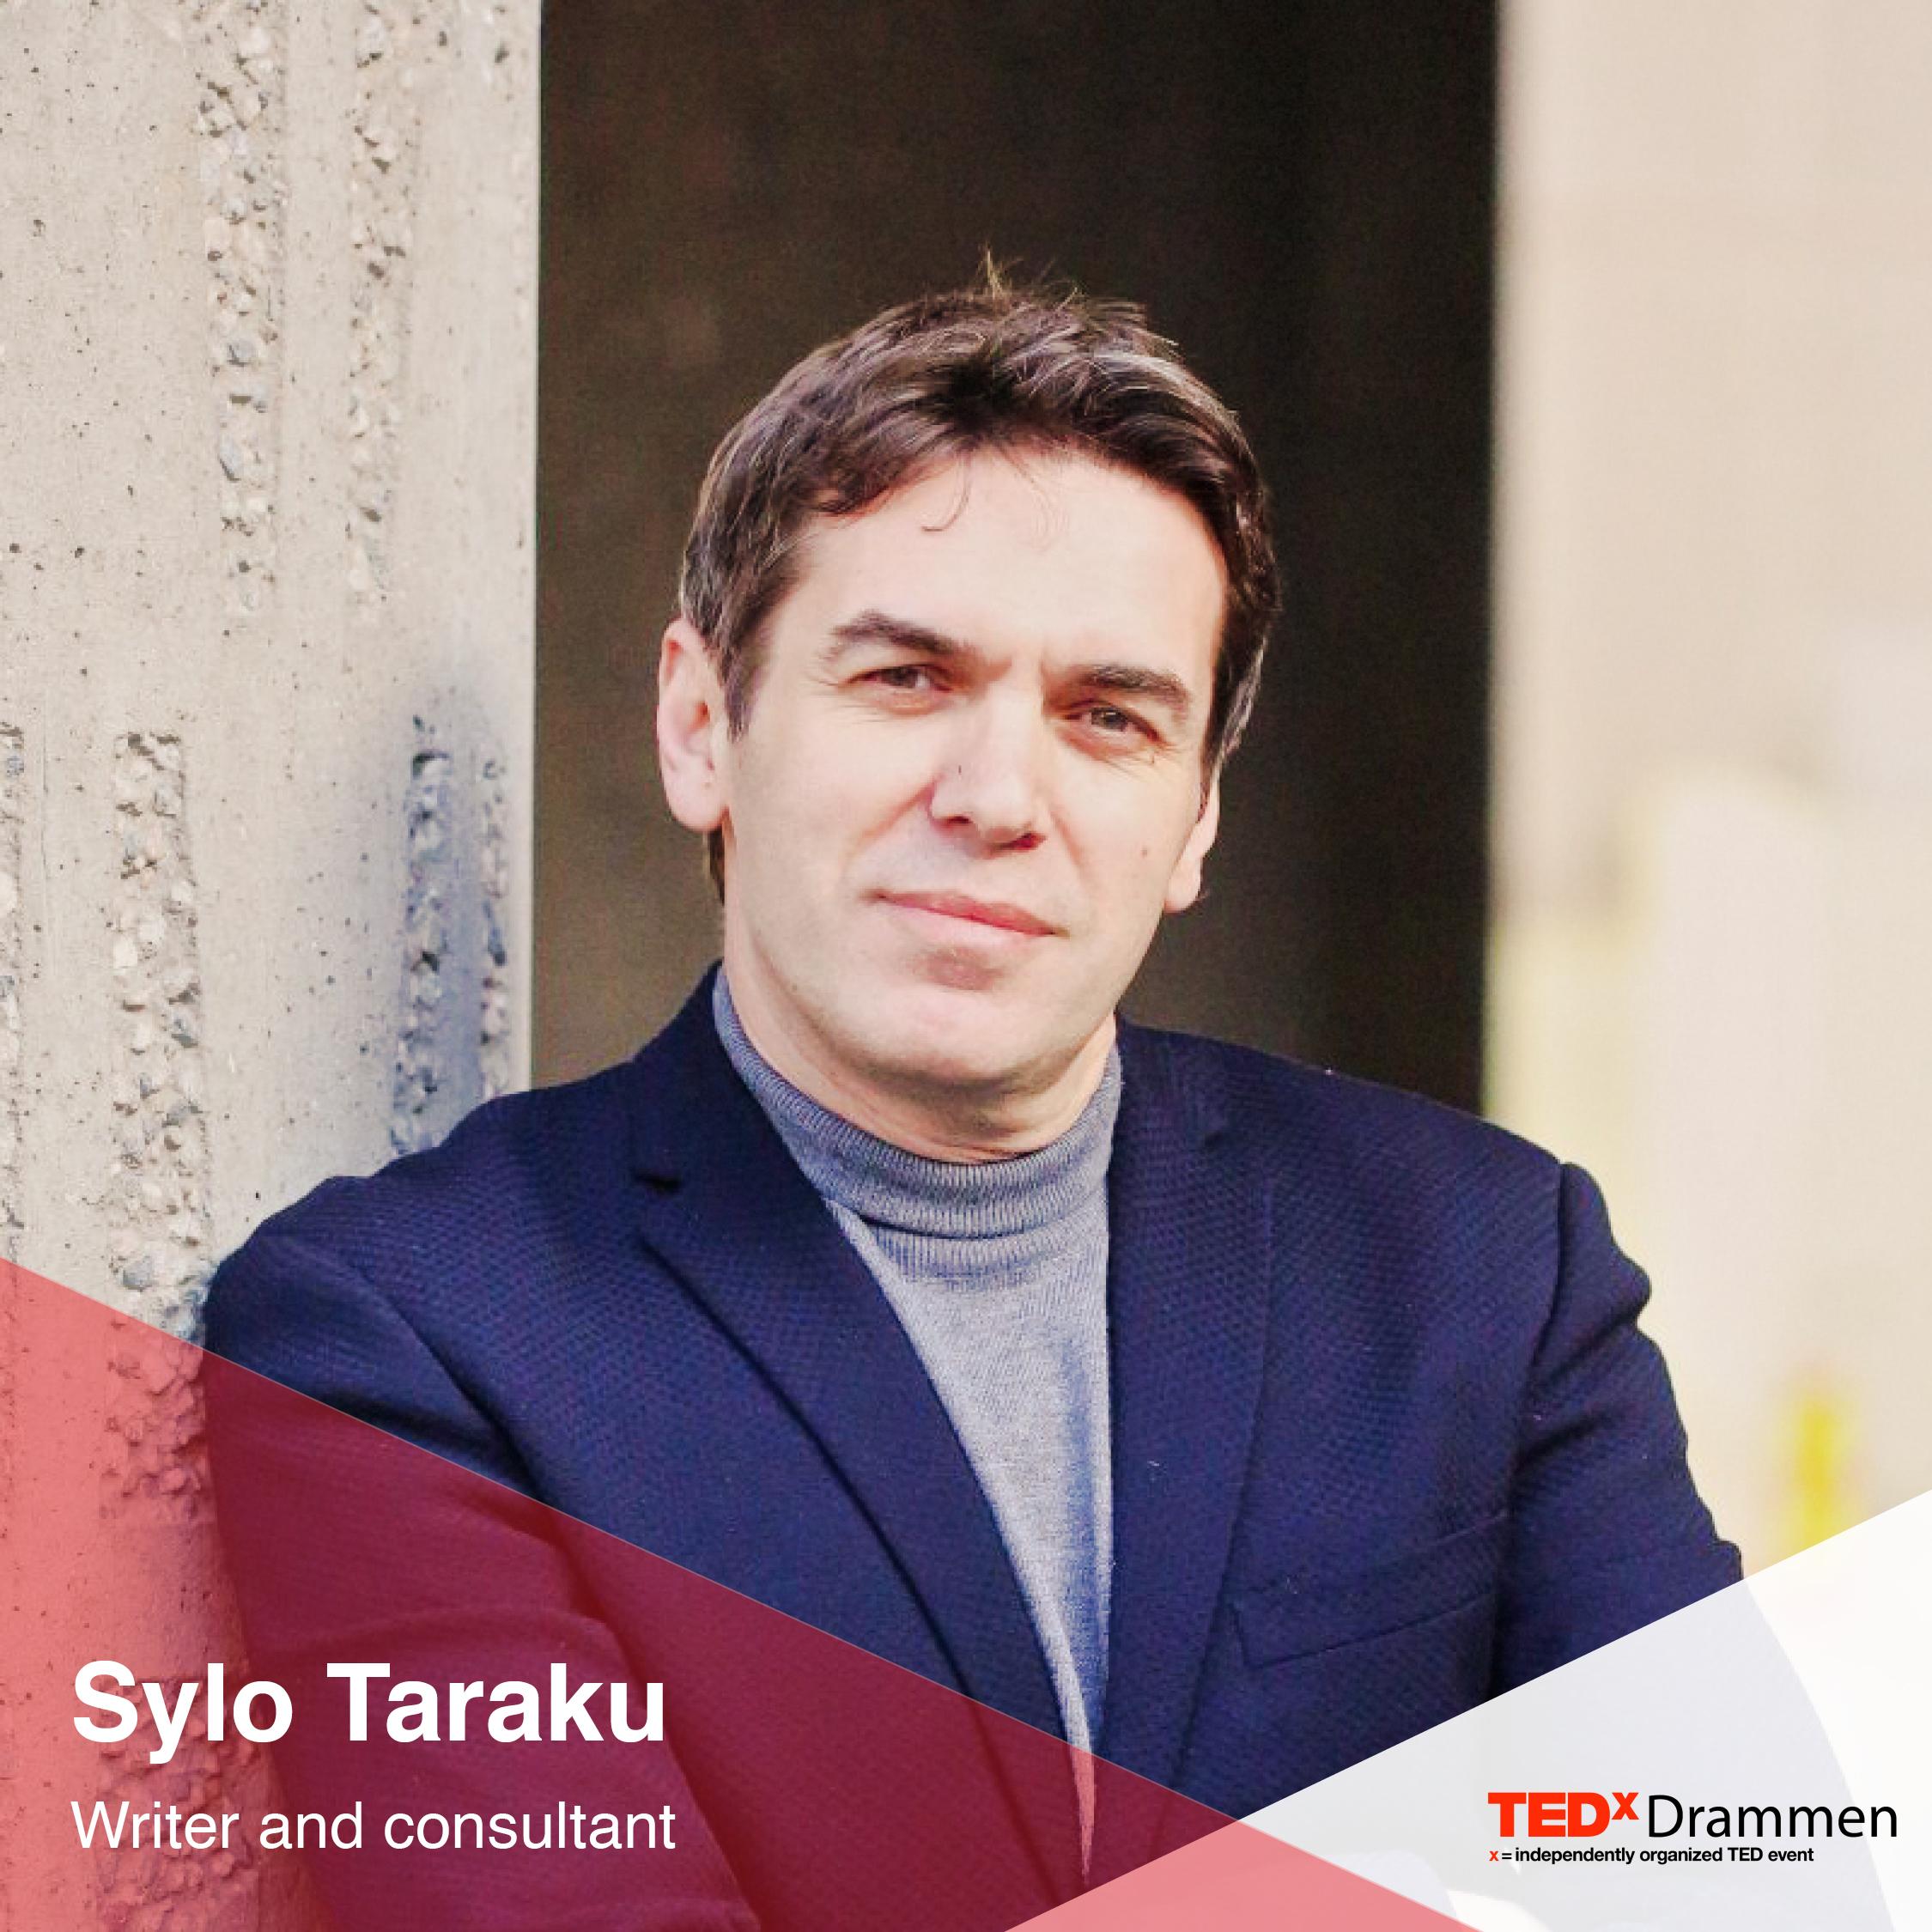 Sylo Taraku